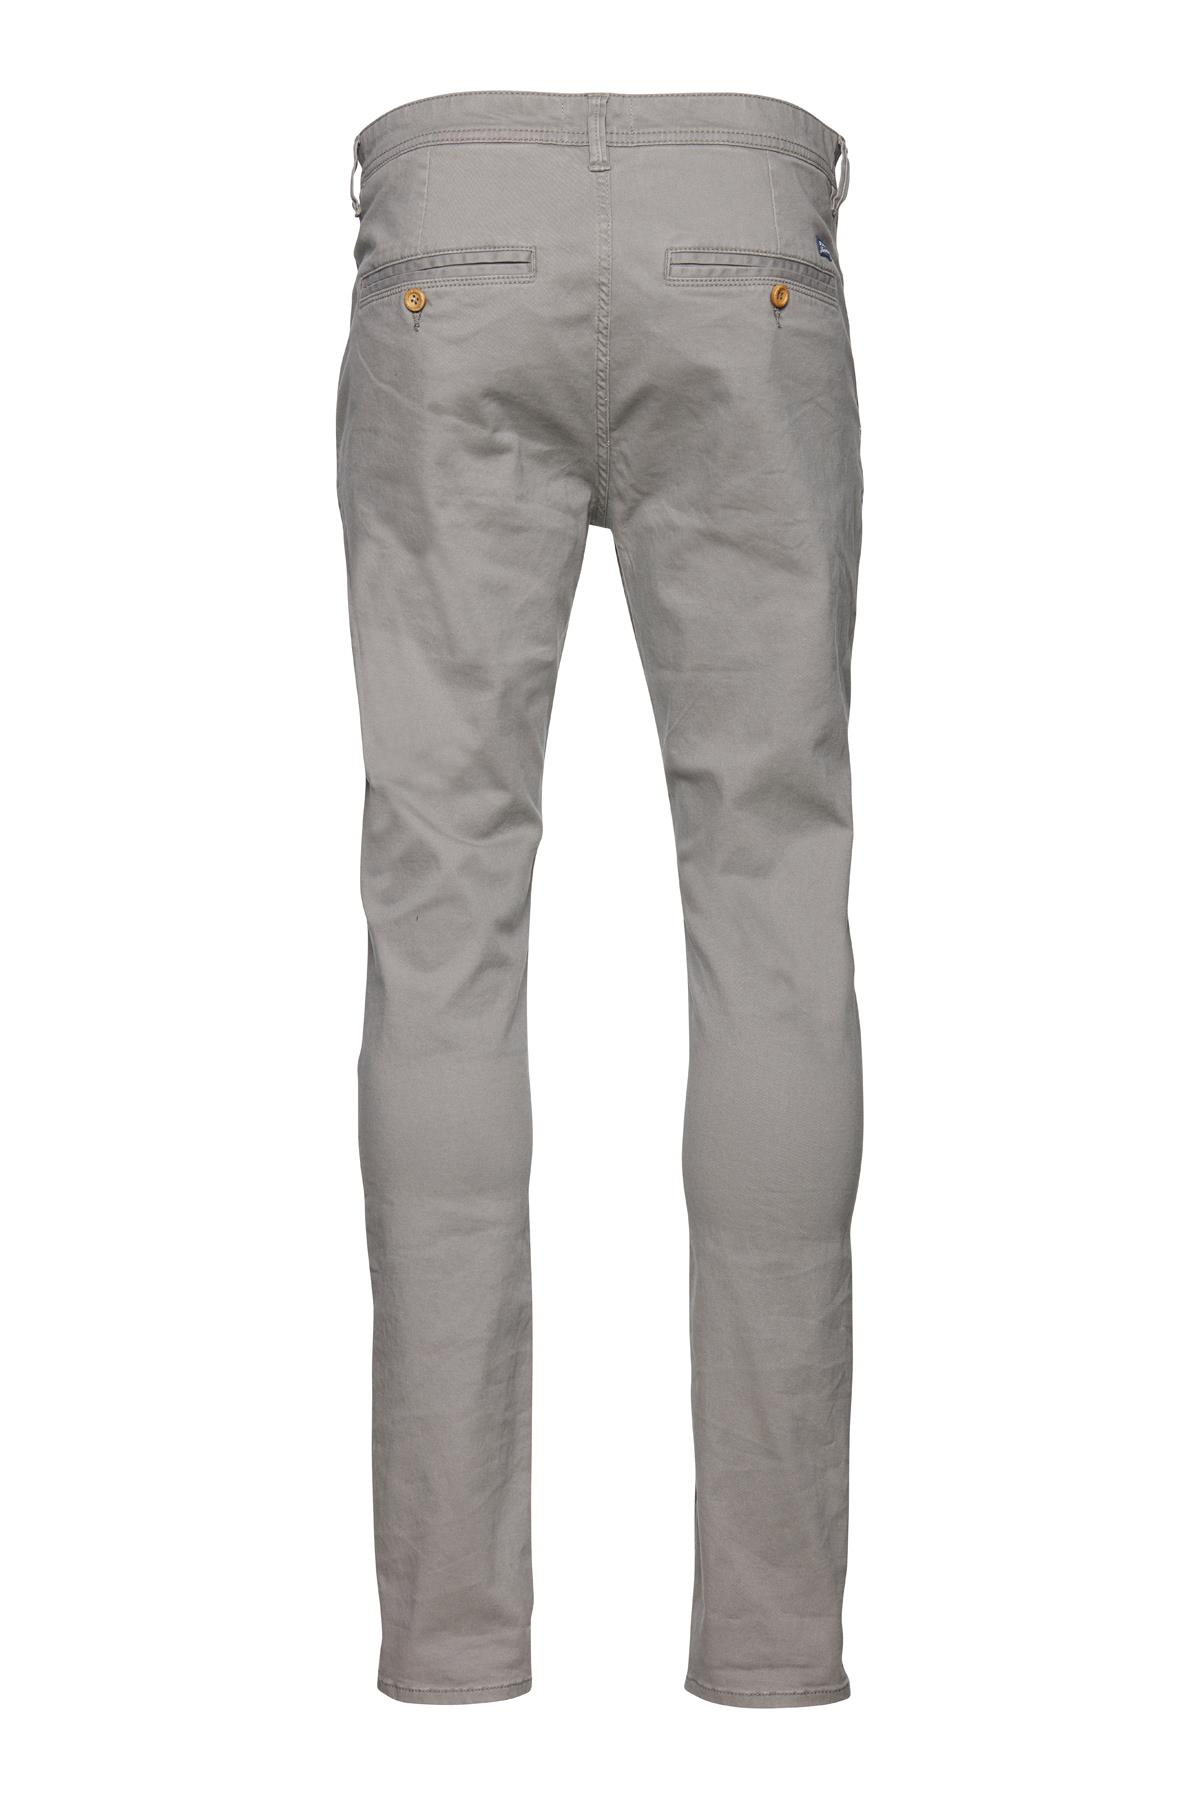 Ebony Grey Pants Casual – Køb Ebony Grey Pants Casual fra str. 33-36 her